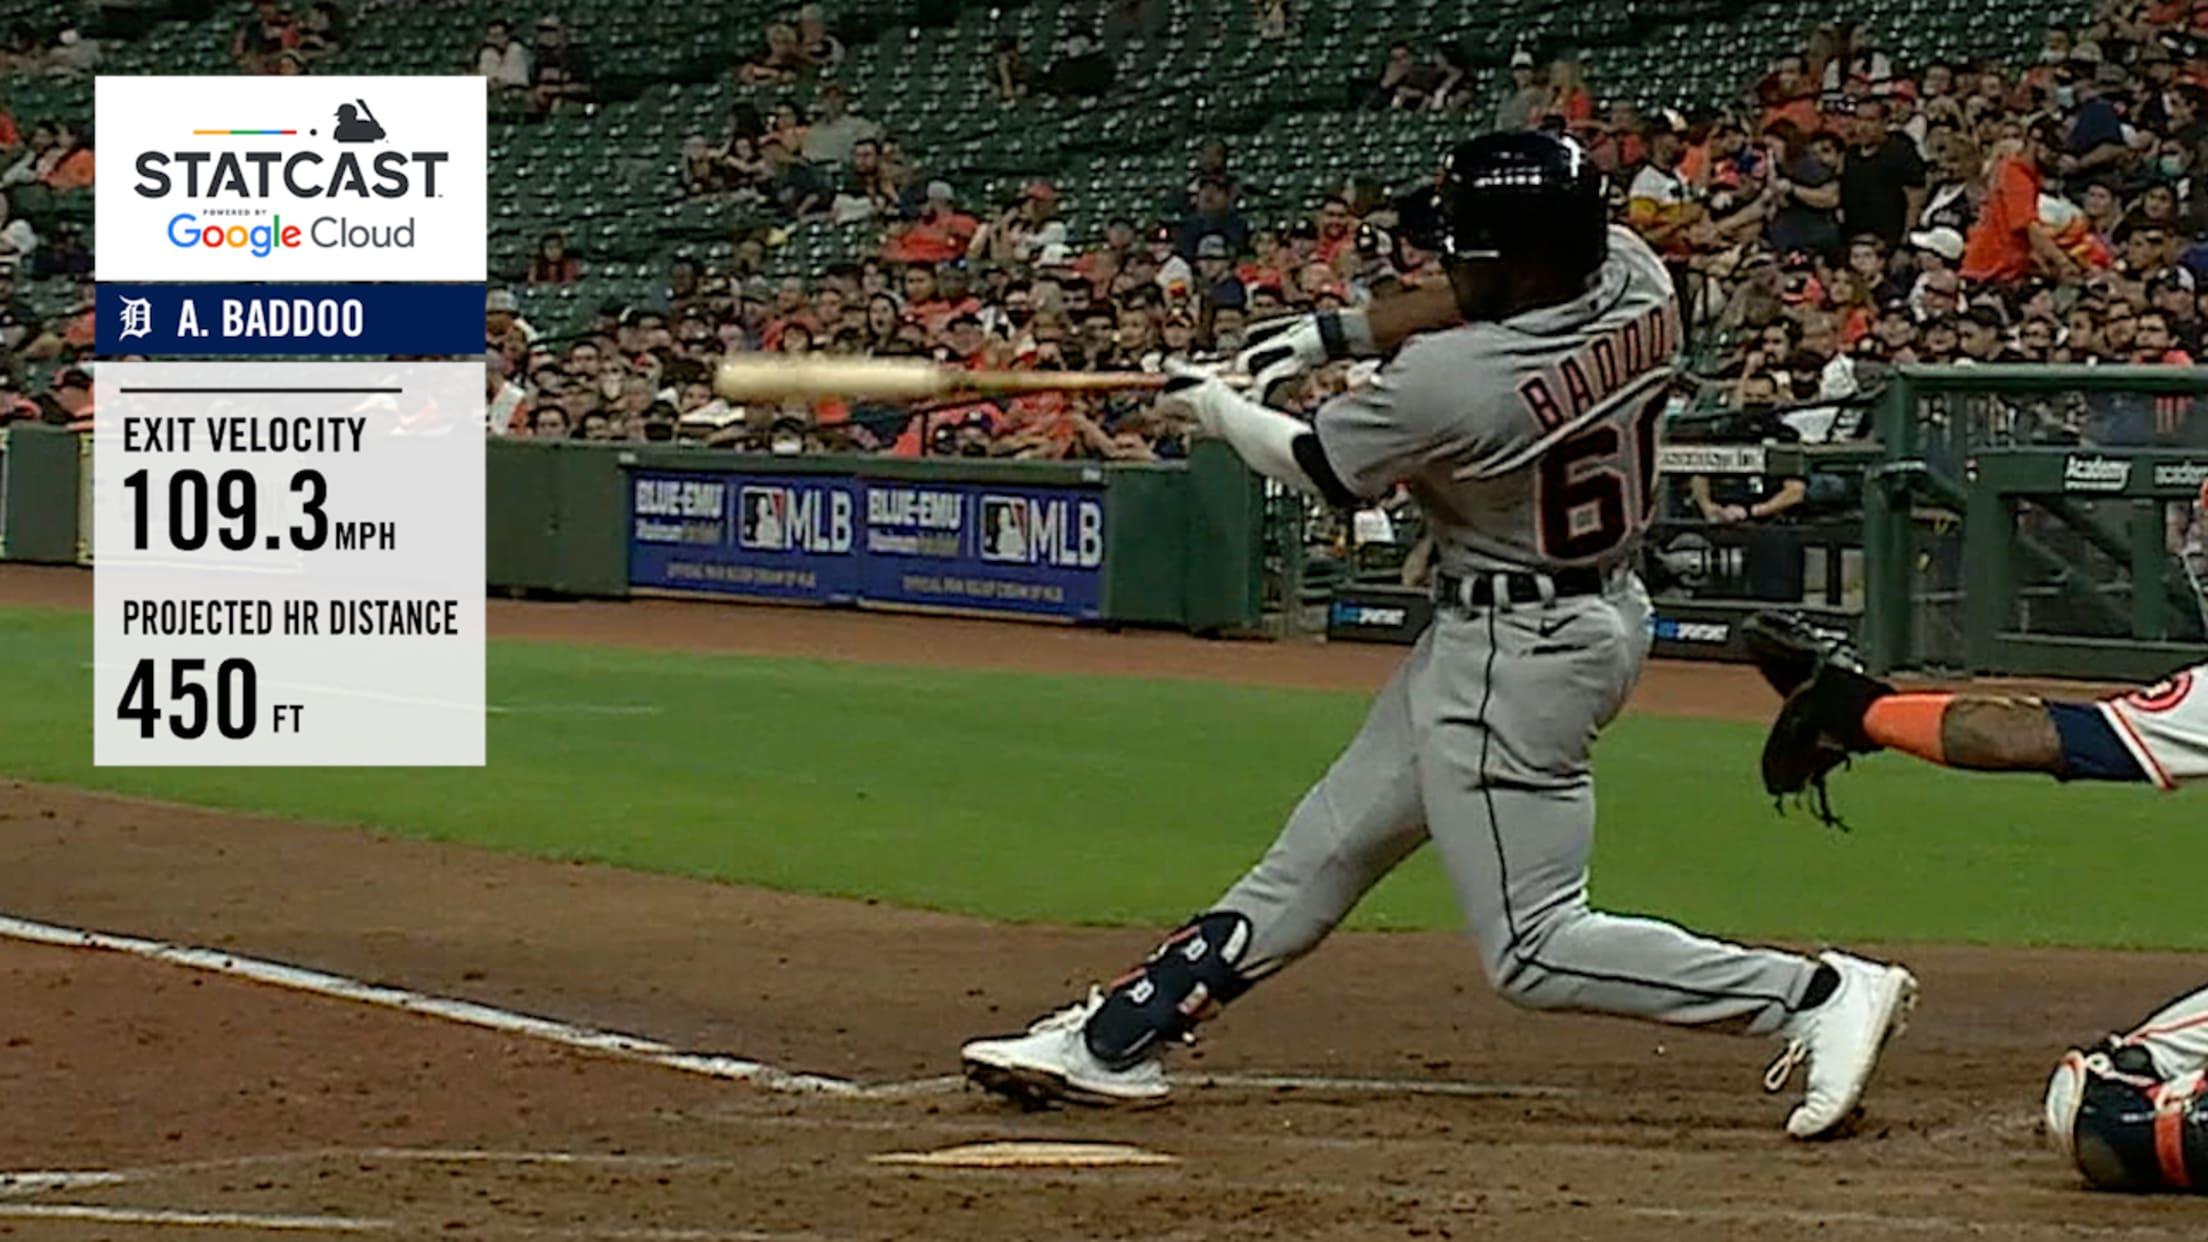 Akil Baddoo's 450-foot home run